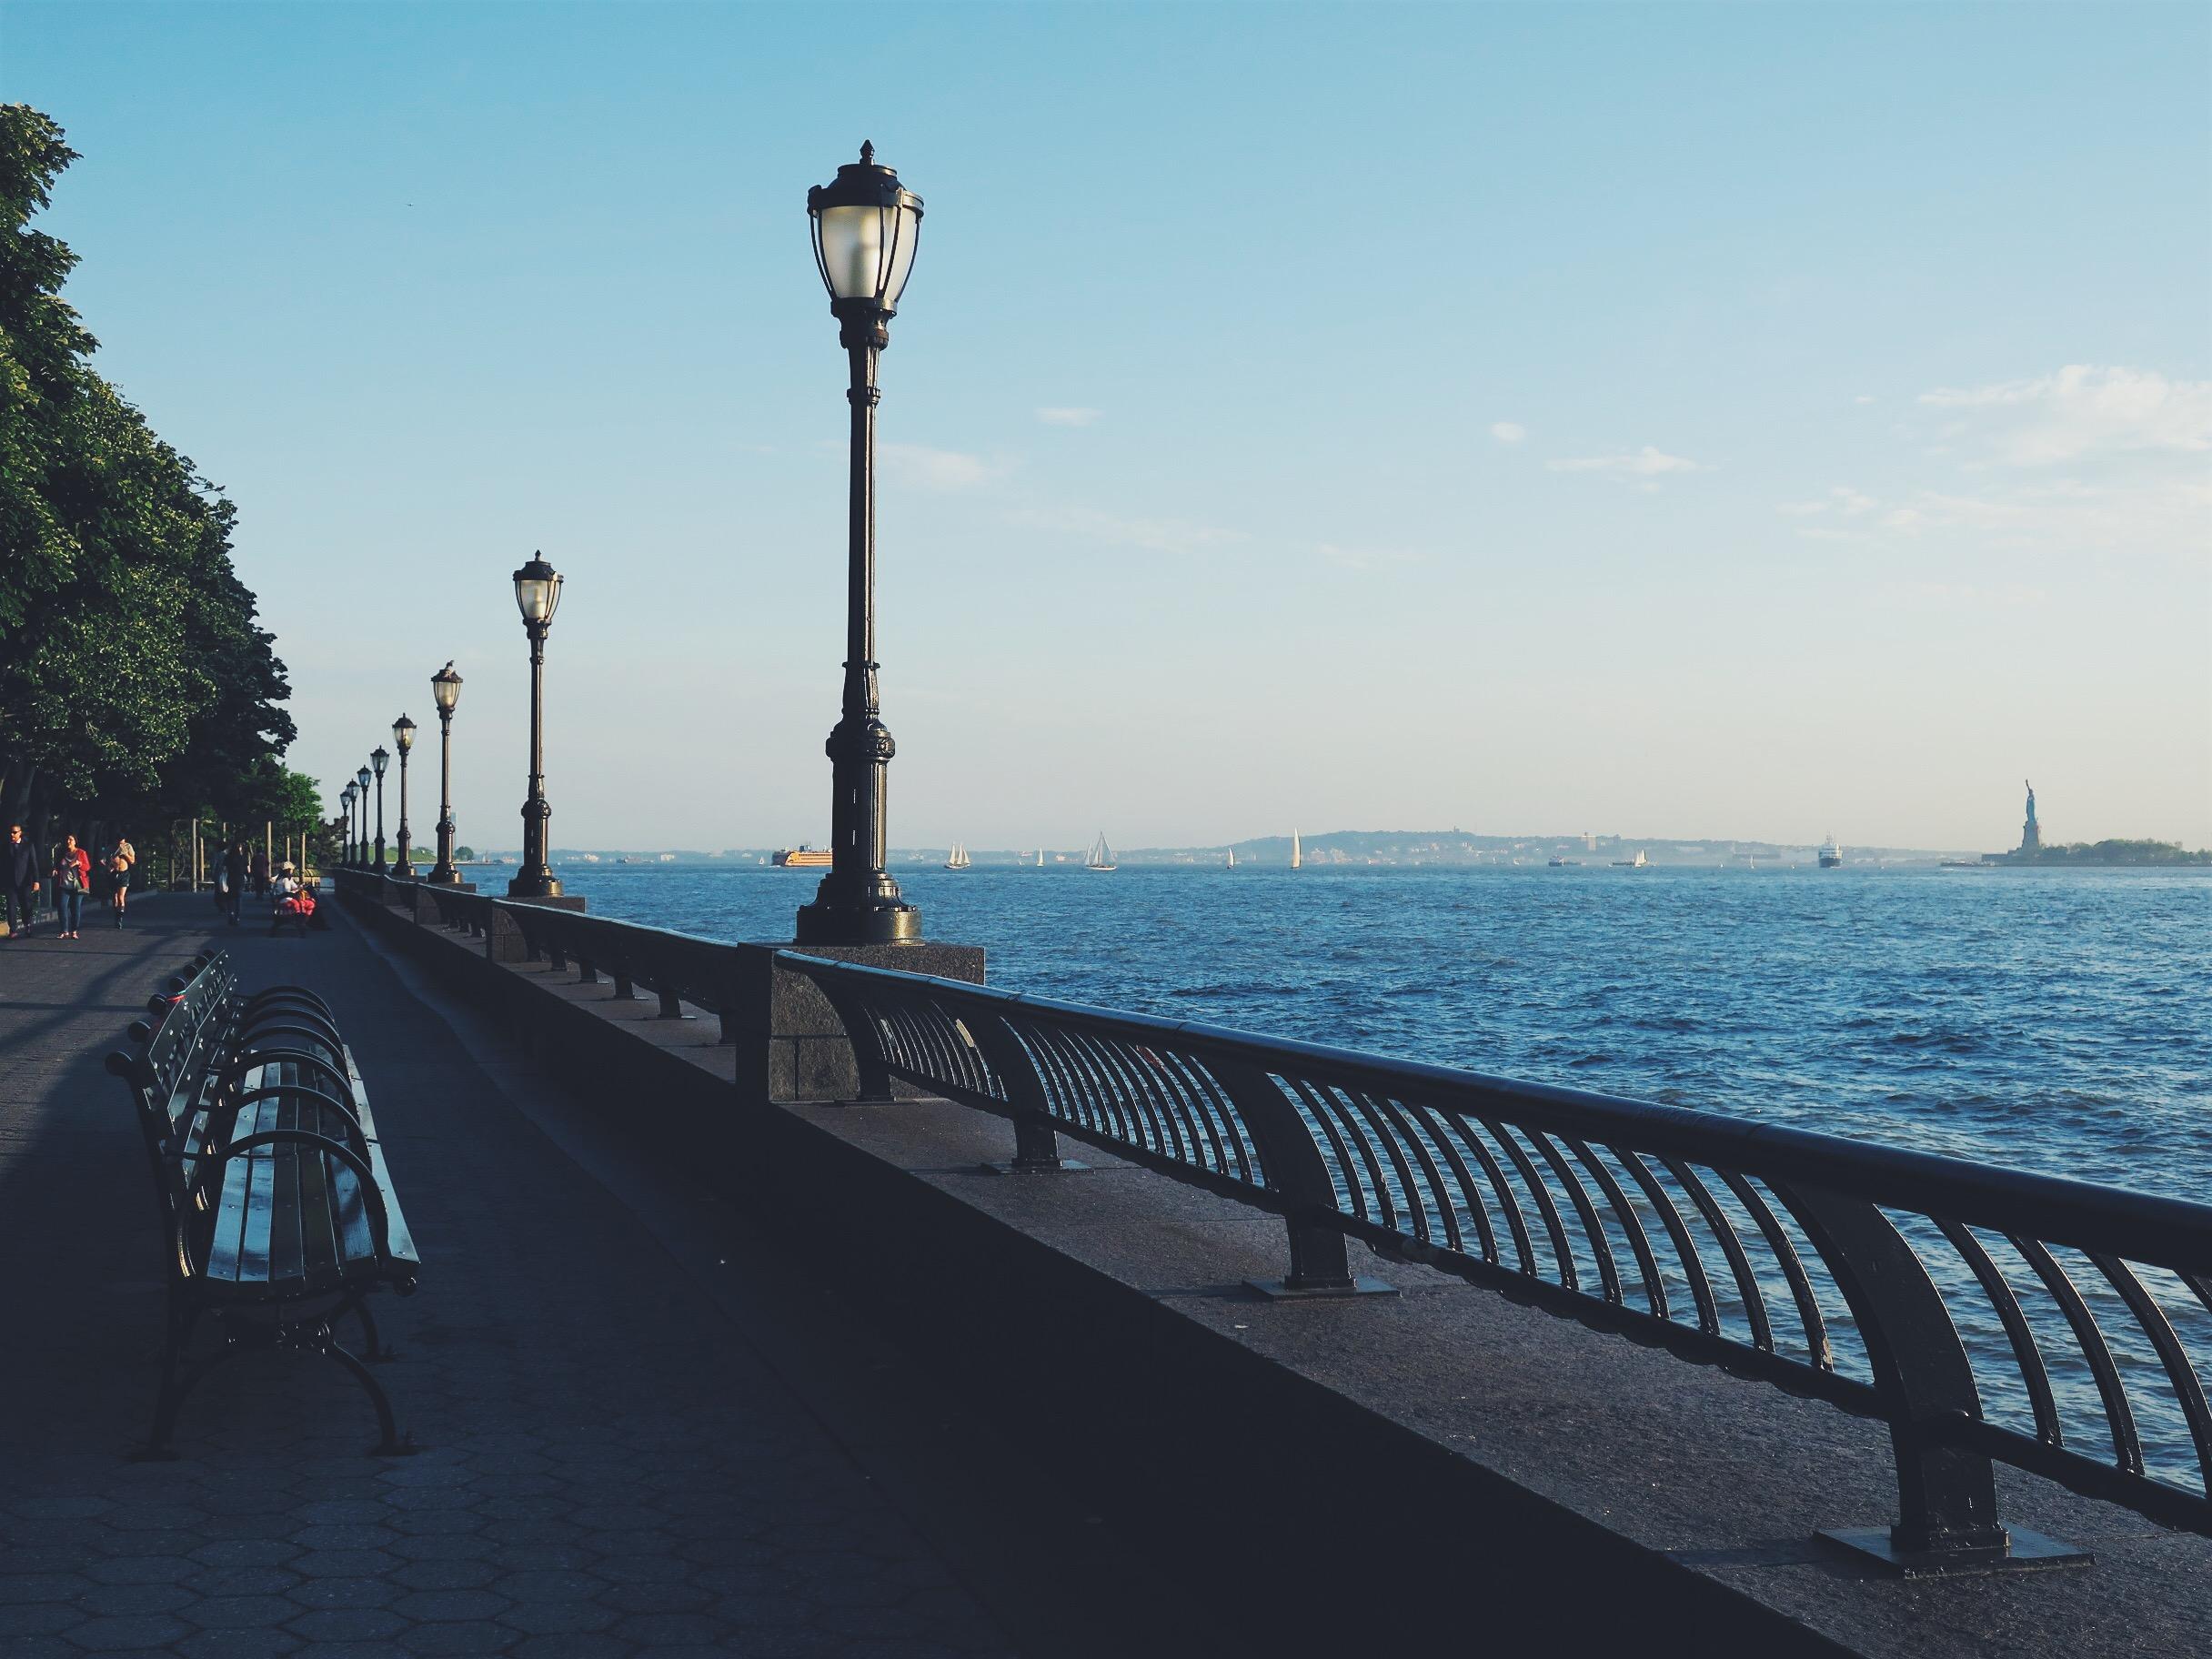 The Esplanade at Battery Park City